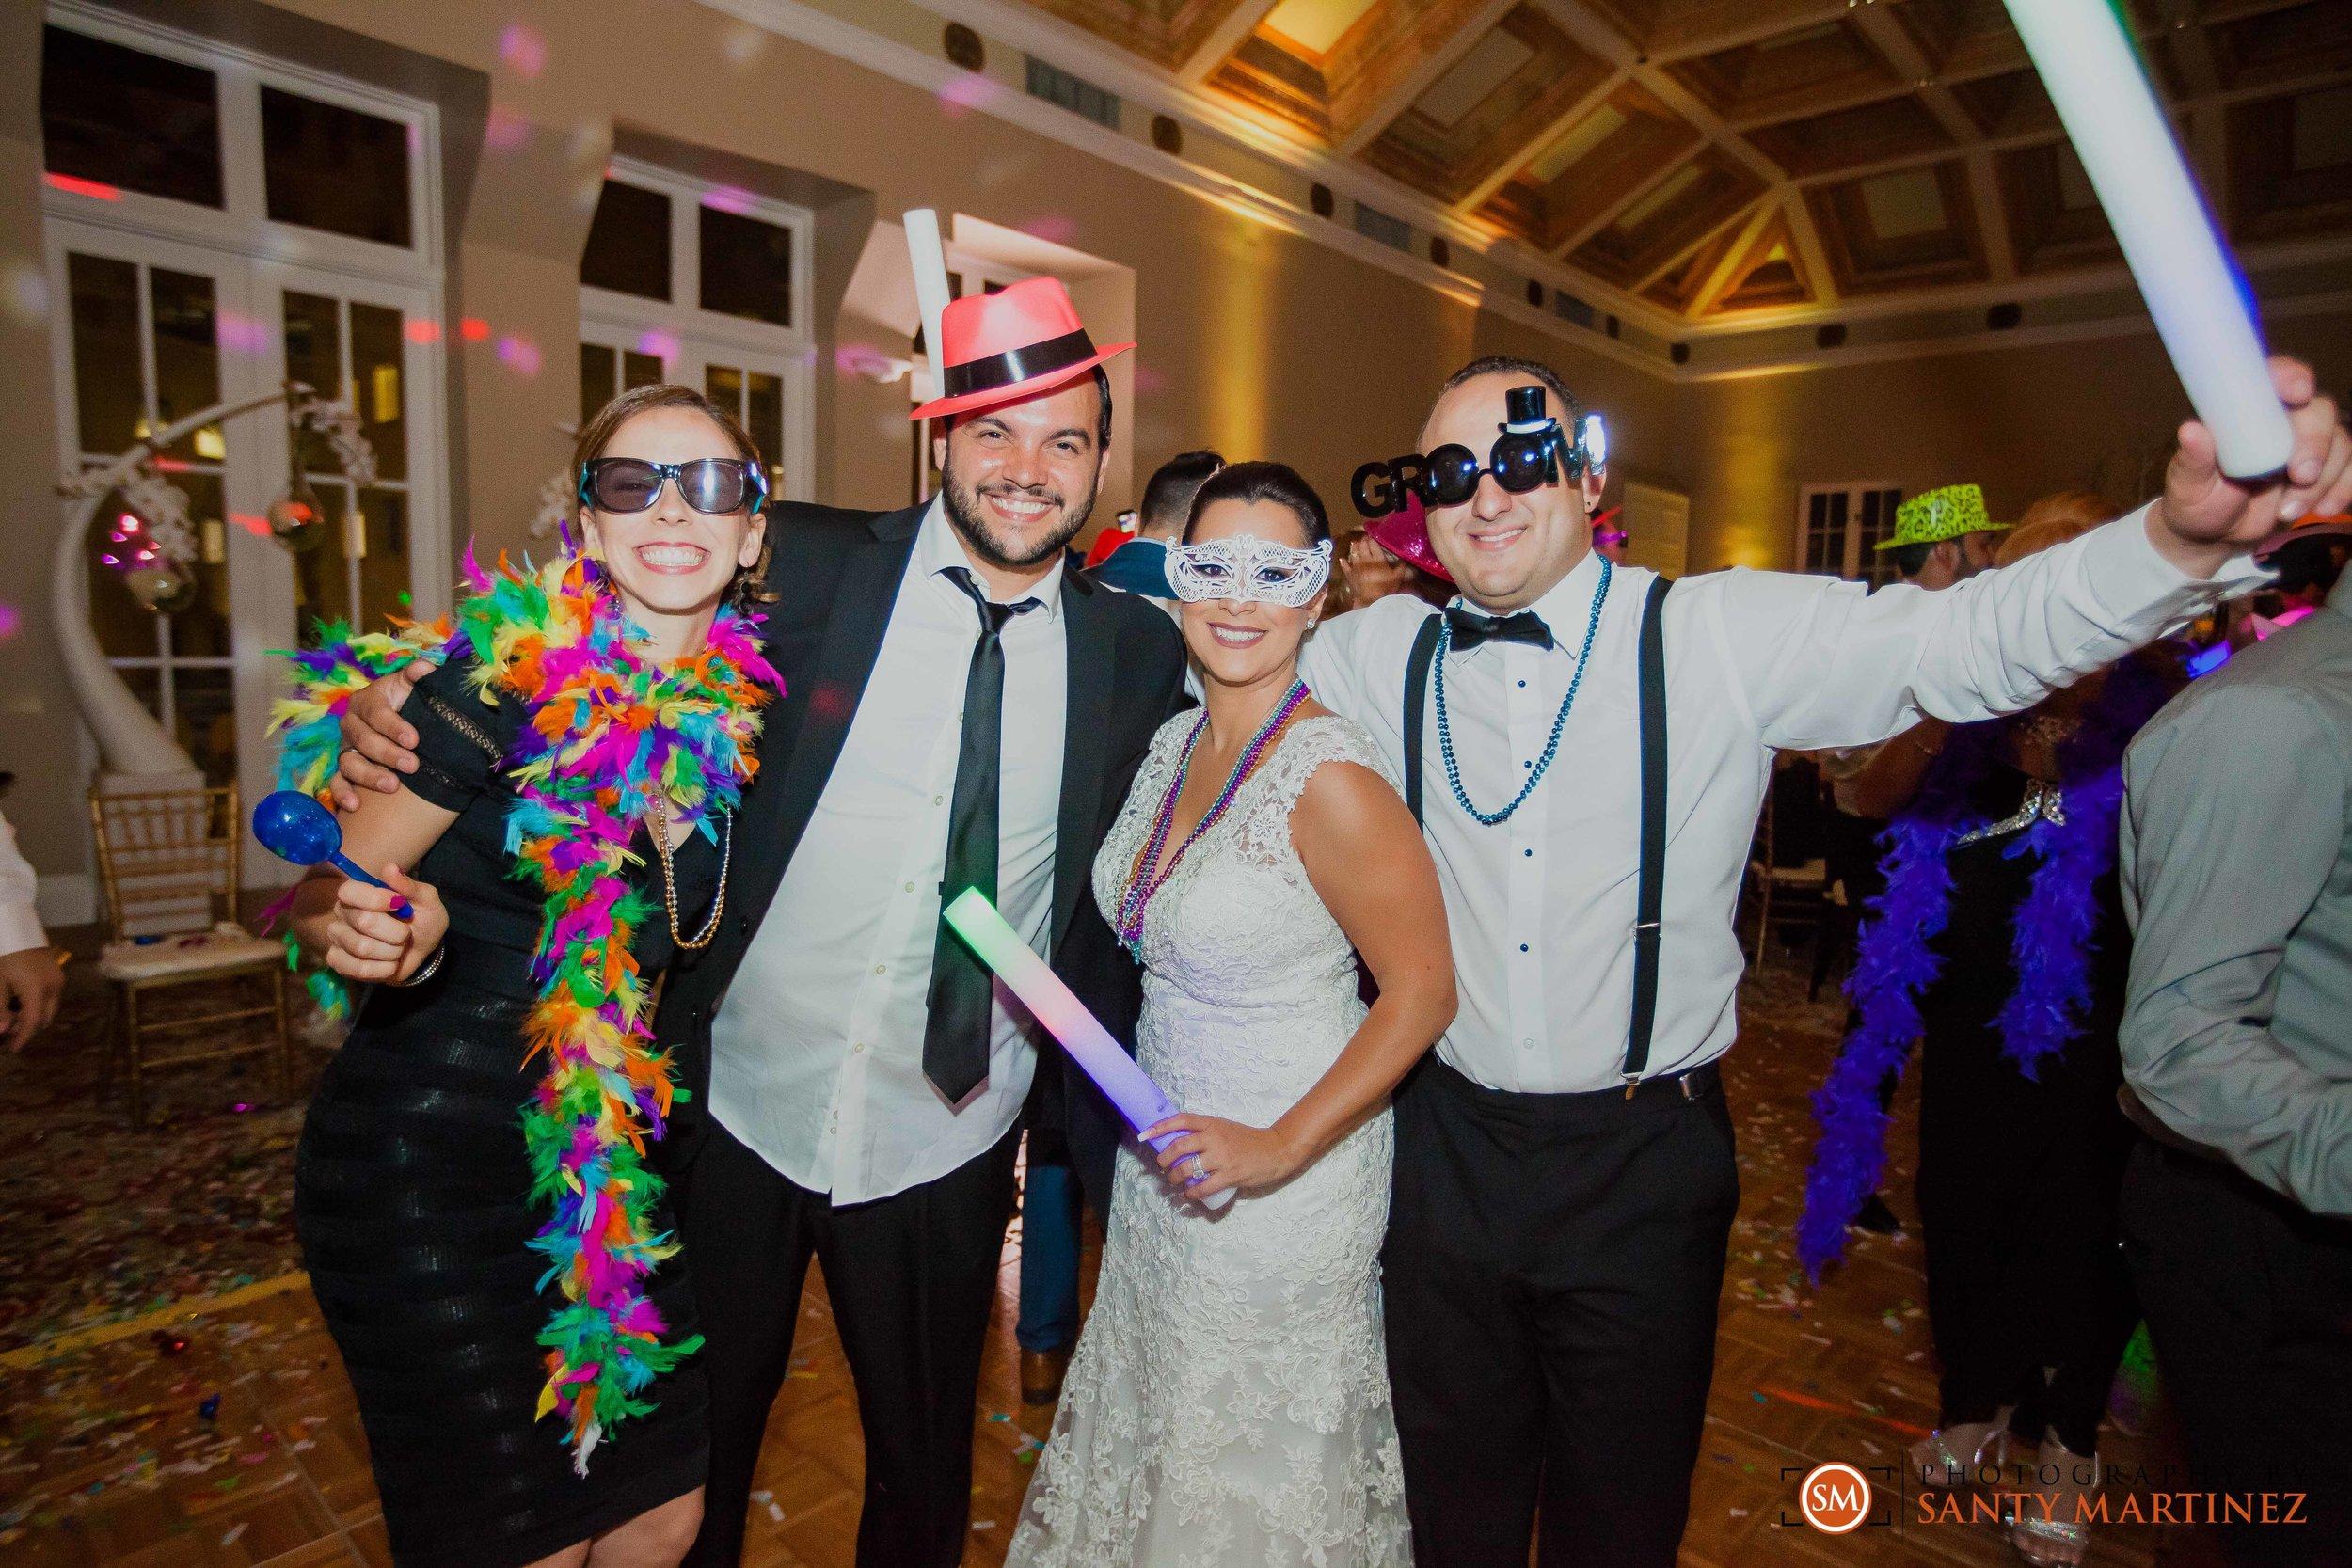 Wedding Douglas Entrance - Photography by Santy Martinez-55.jpg